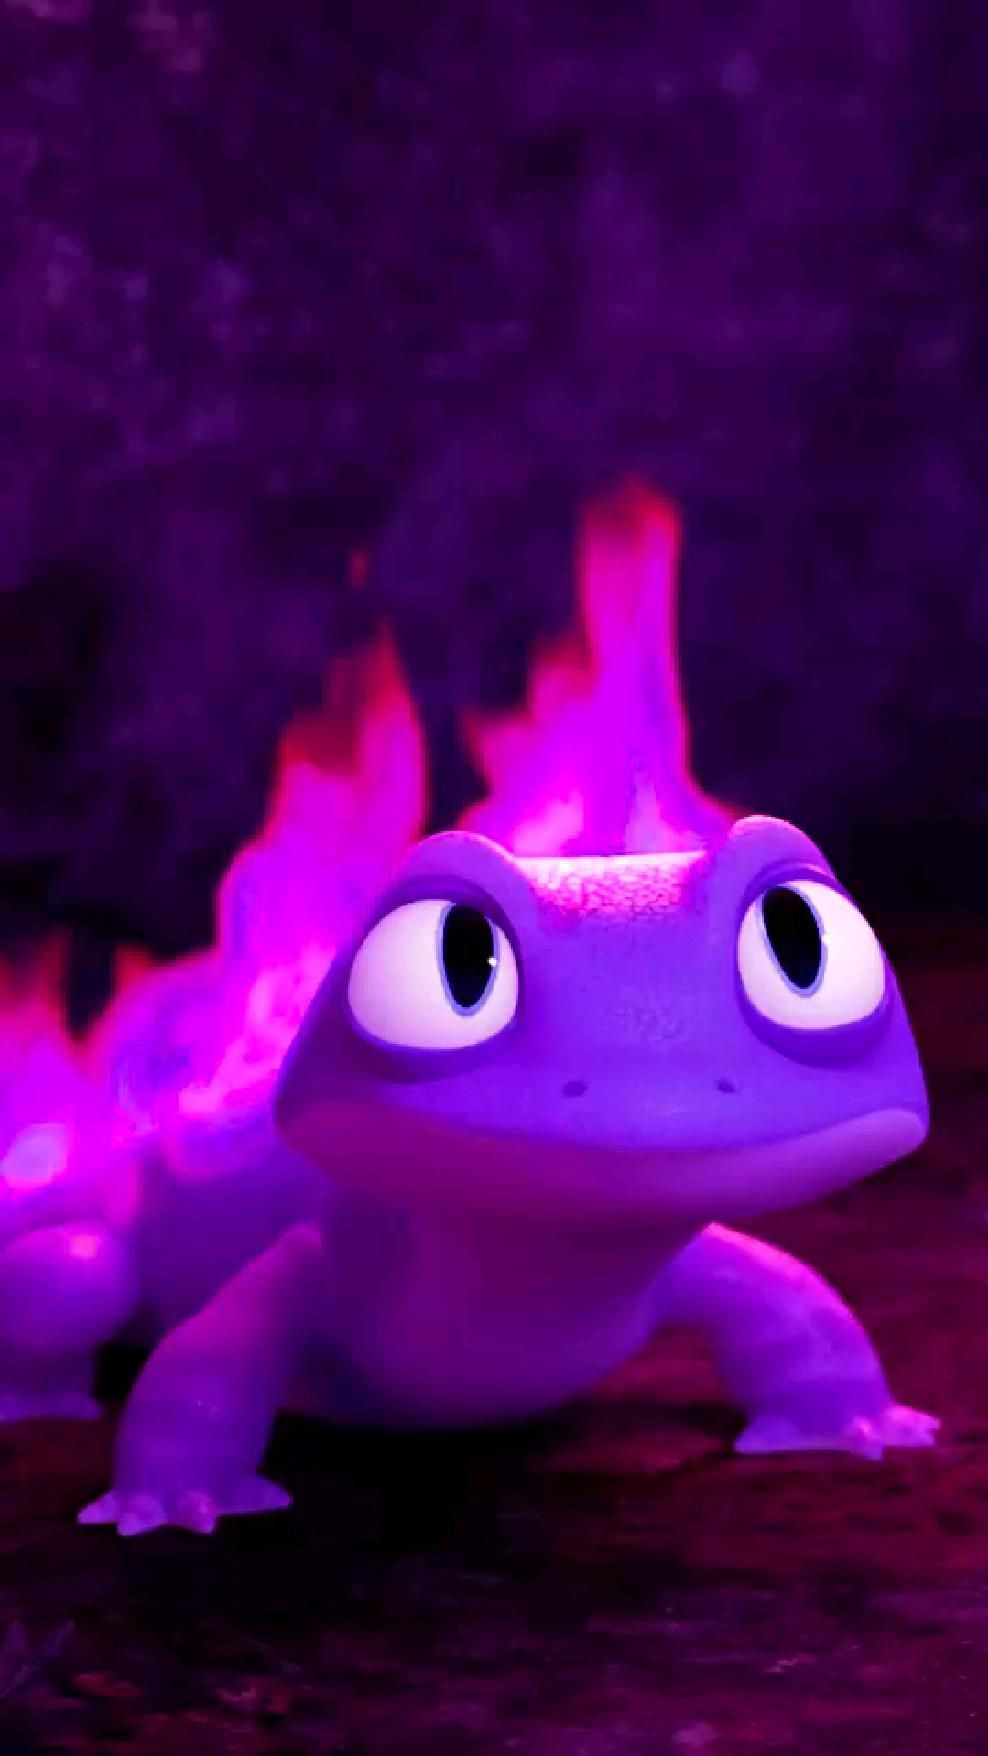 frozen princess character videos photo Disney cartoon pascal animation